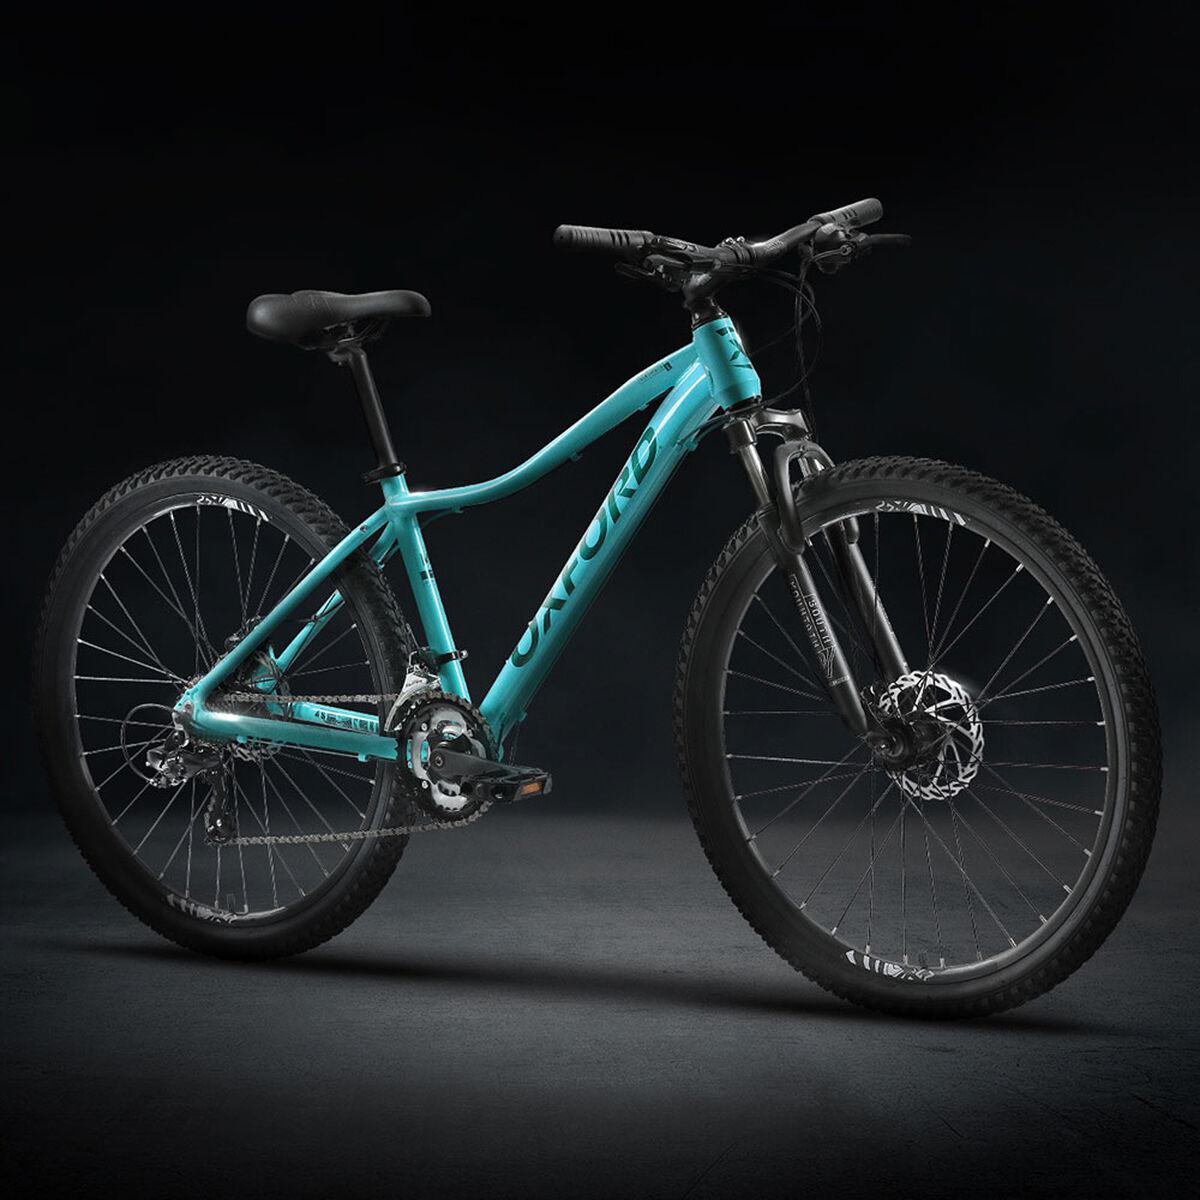 Bicicleta Mountain Bike Mujer Oxford Venus1 Aro 27.5